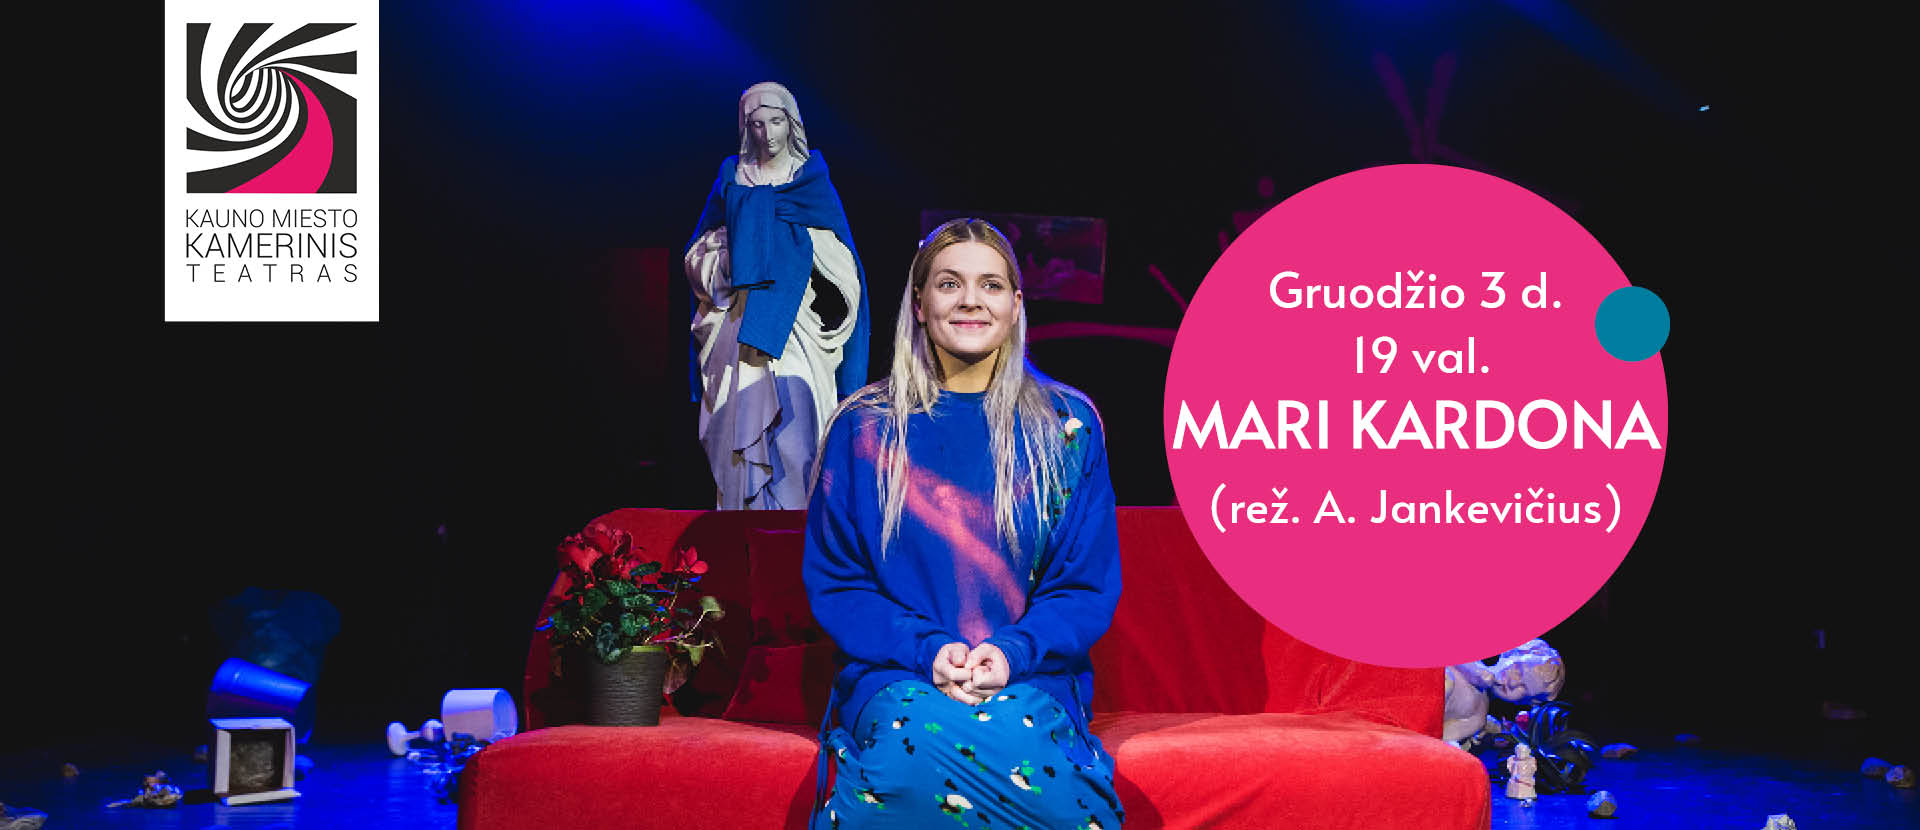 LIVE: Kauno miesto kamerinis teatras MARI KARDONA (rež. A. Jankevičius)